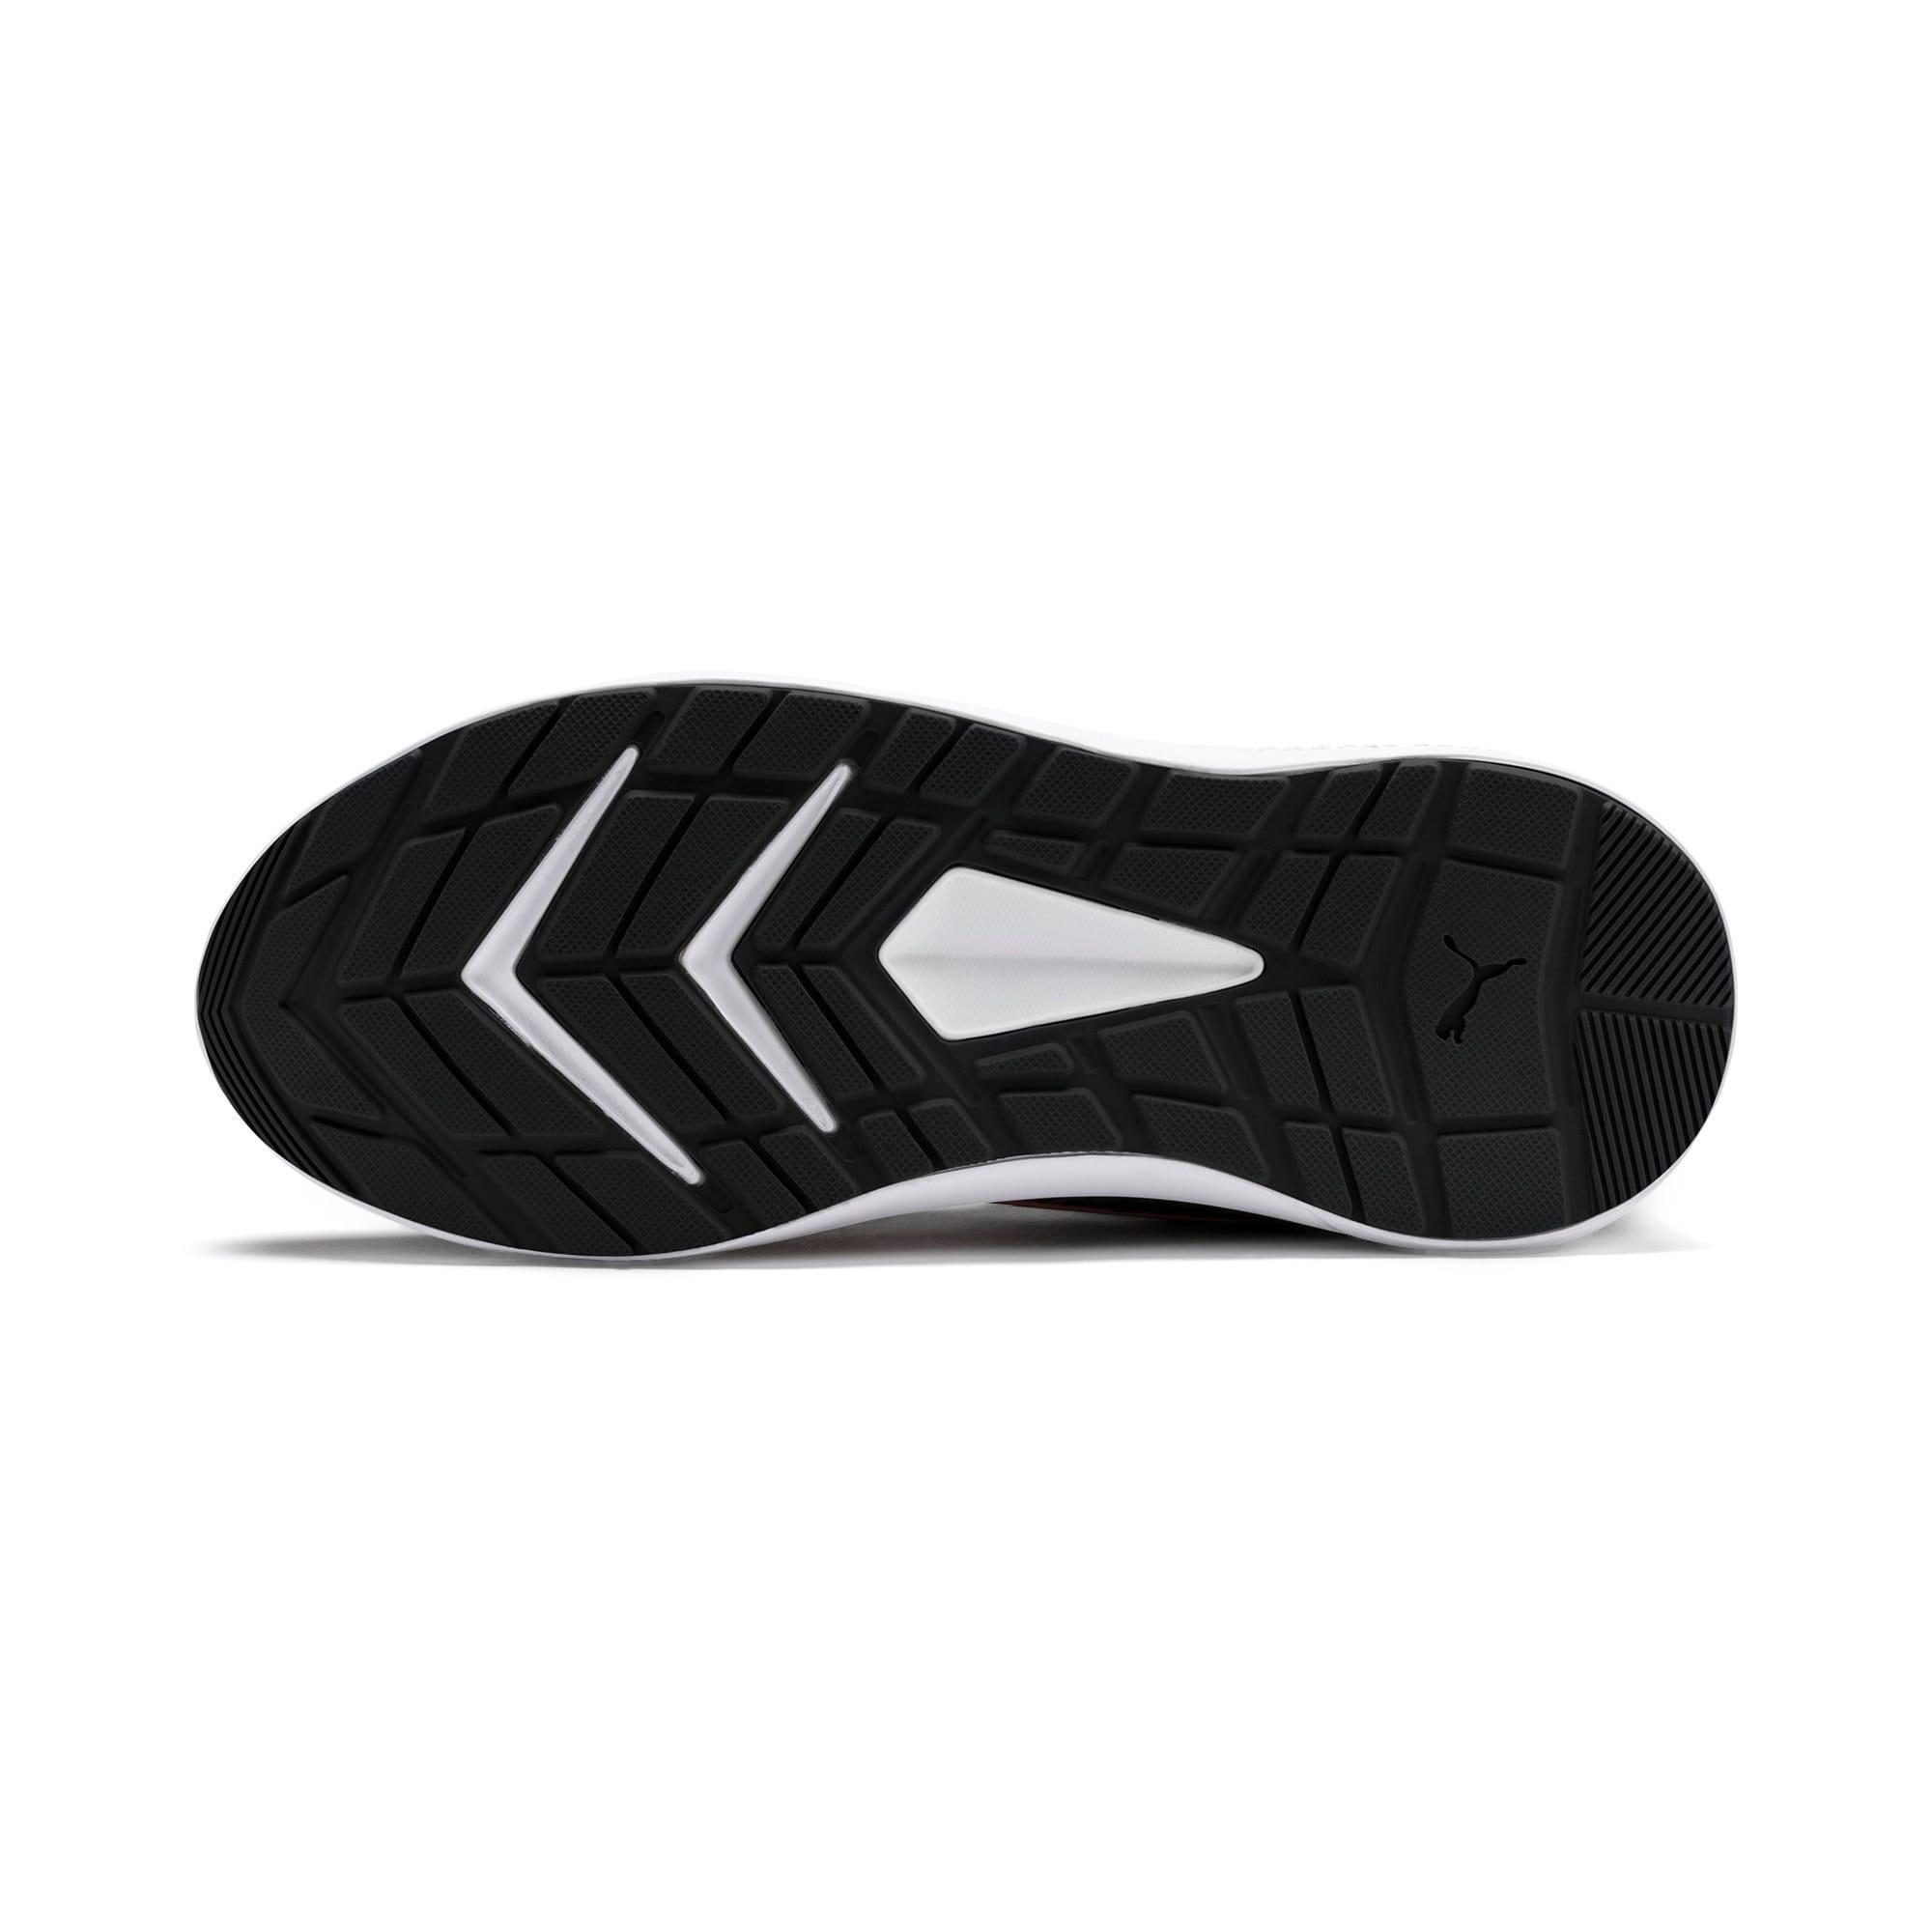 Thumbnail 7 of Escaper Pro Training Shoes, Black-Calypso Coral-White, medium-IND